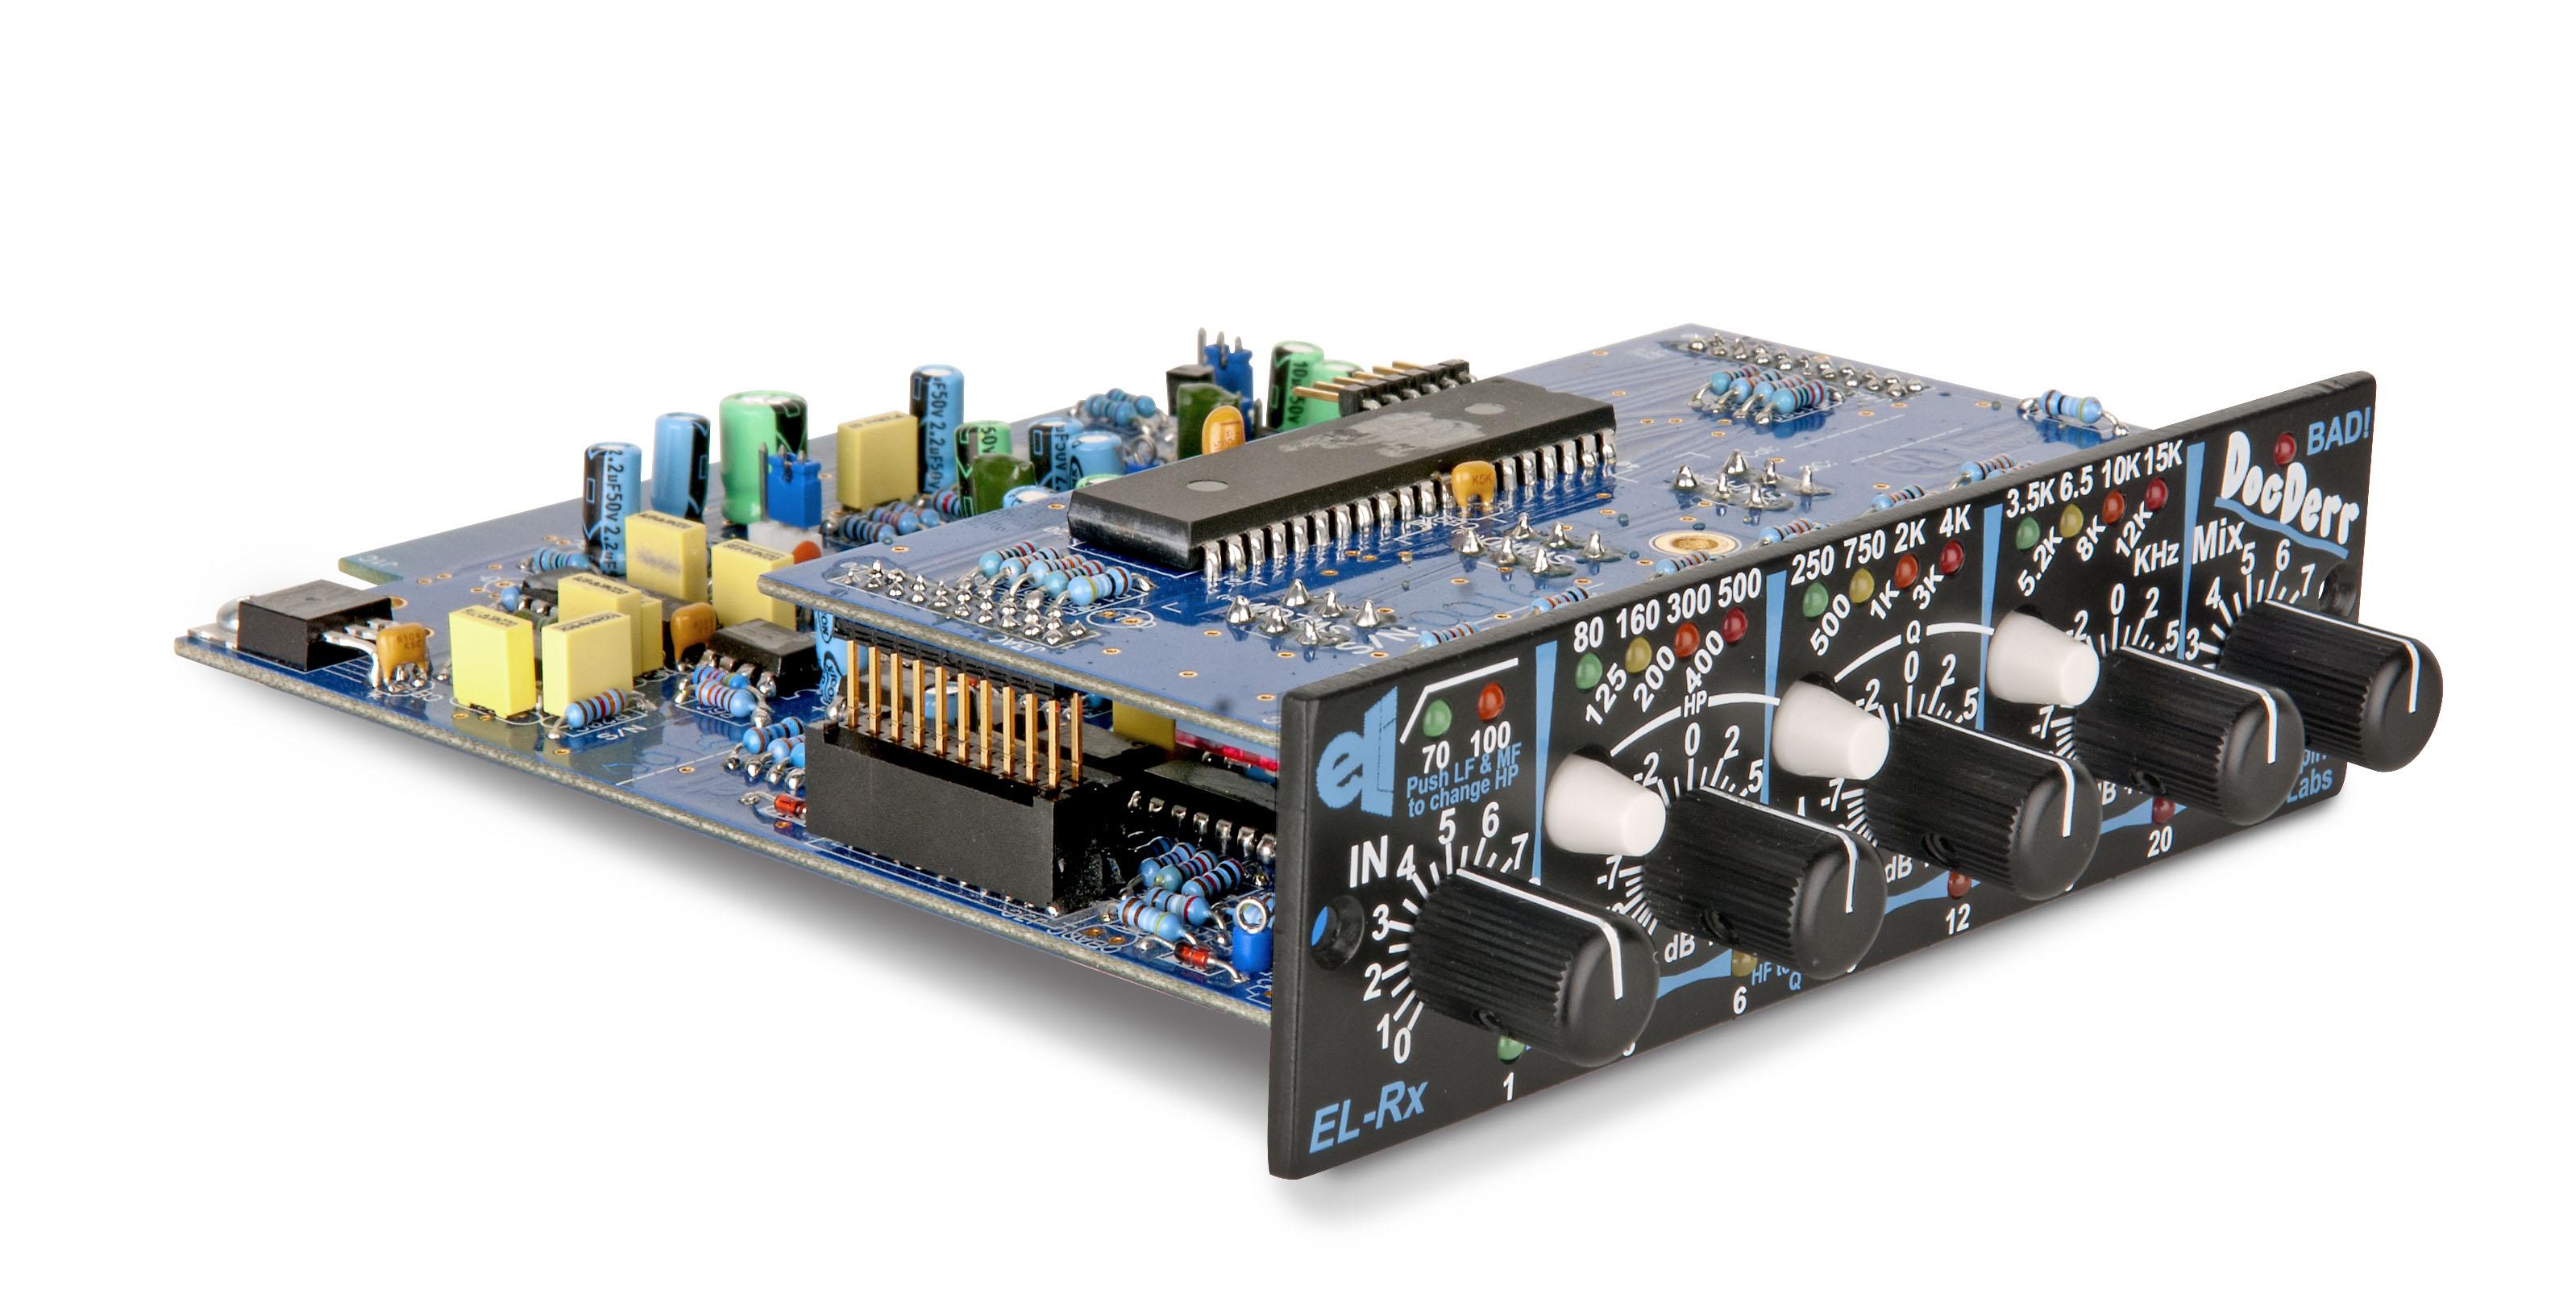 500 series rack modules